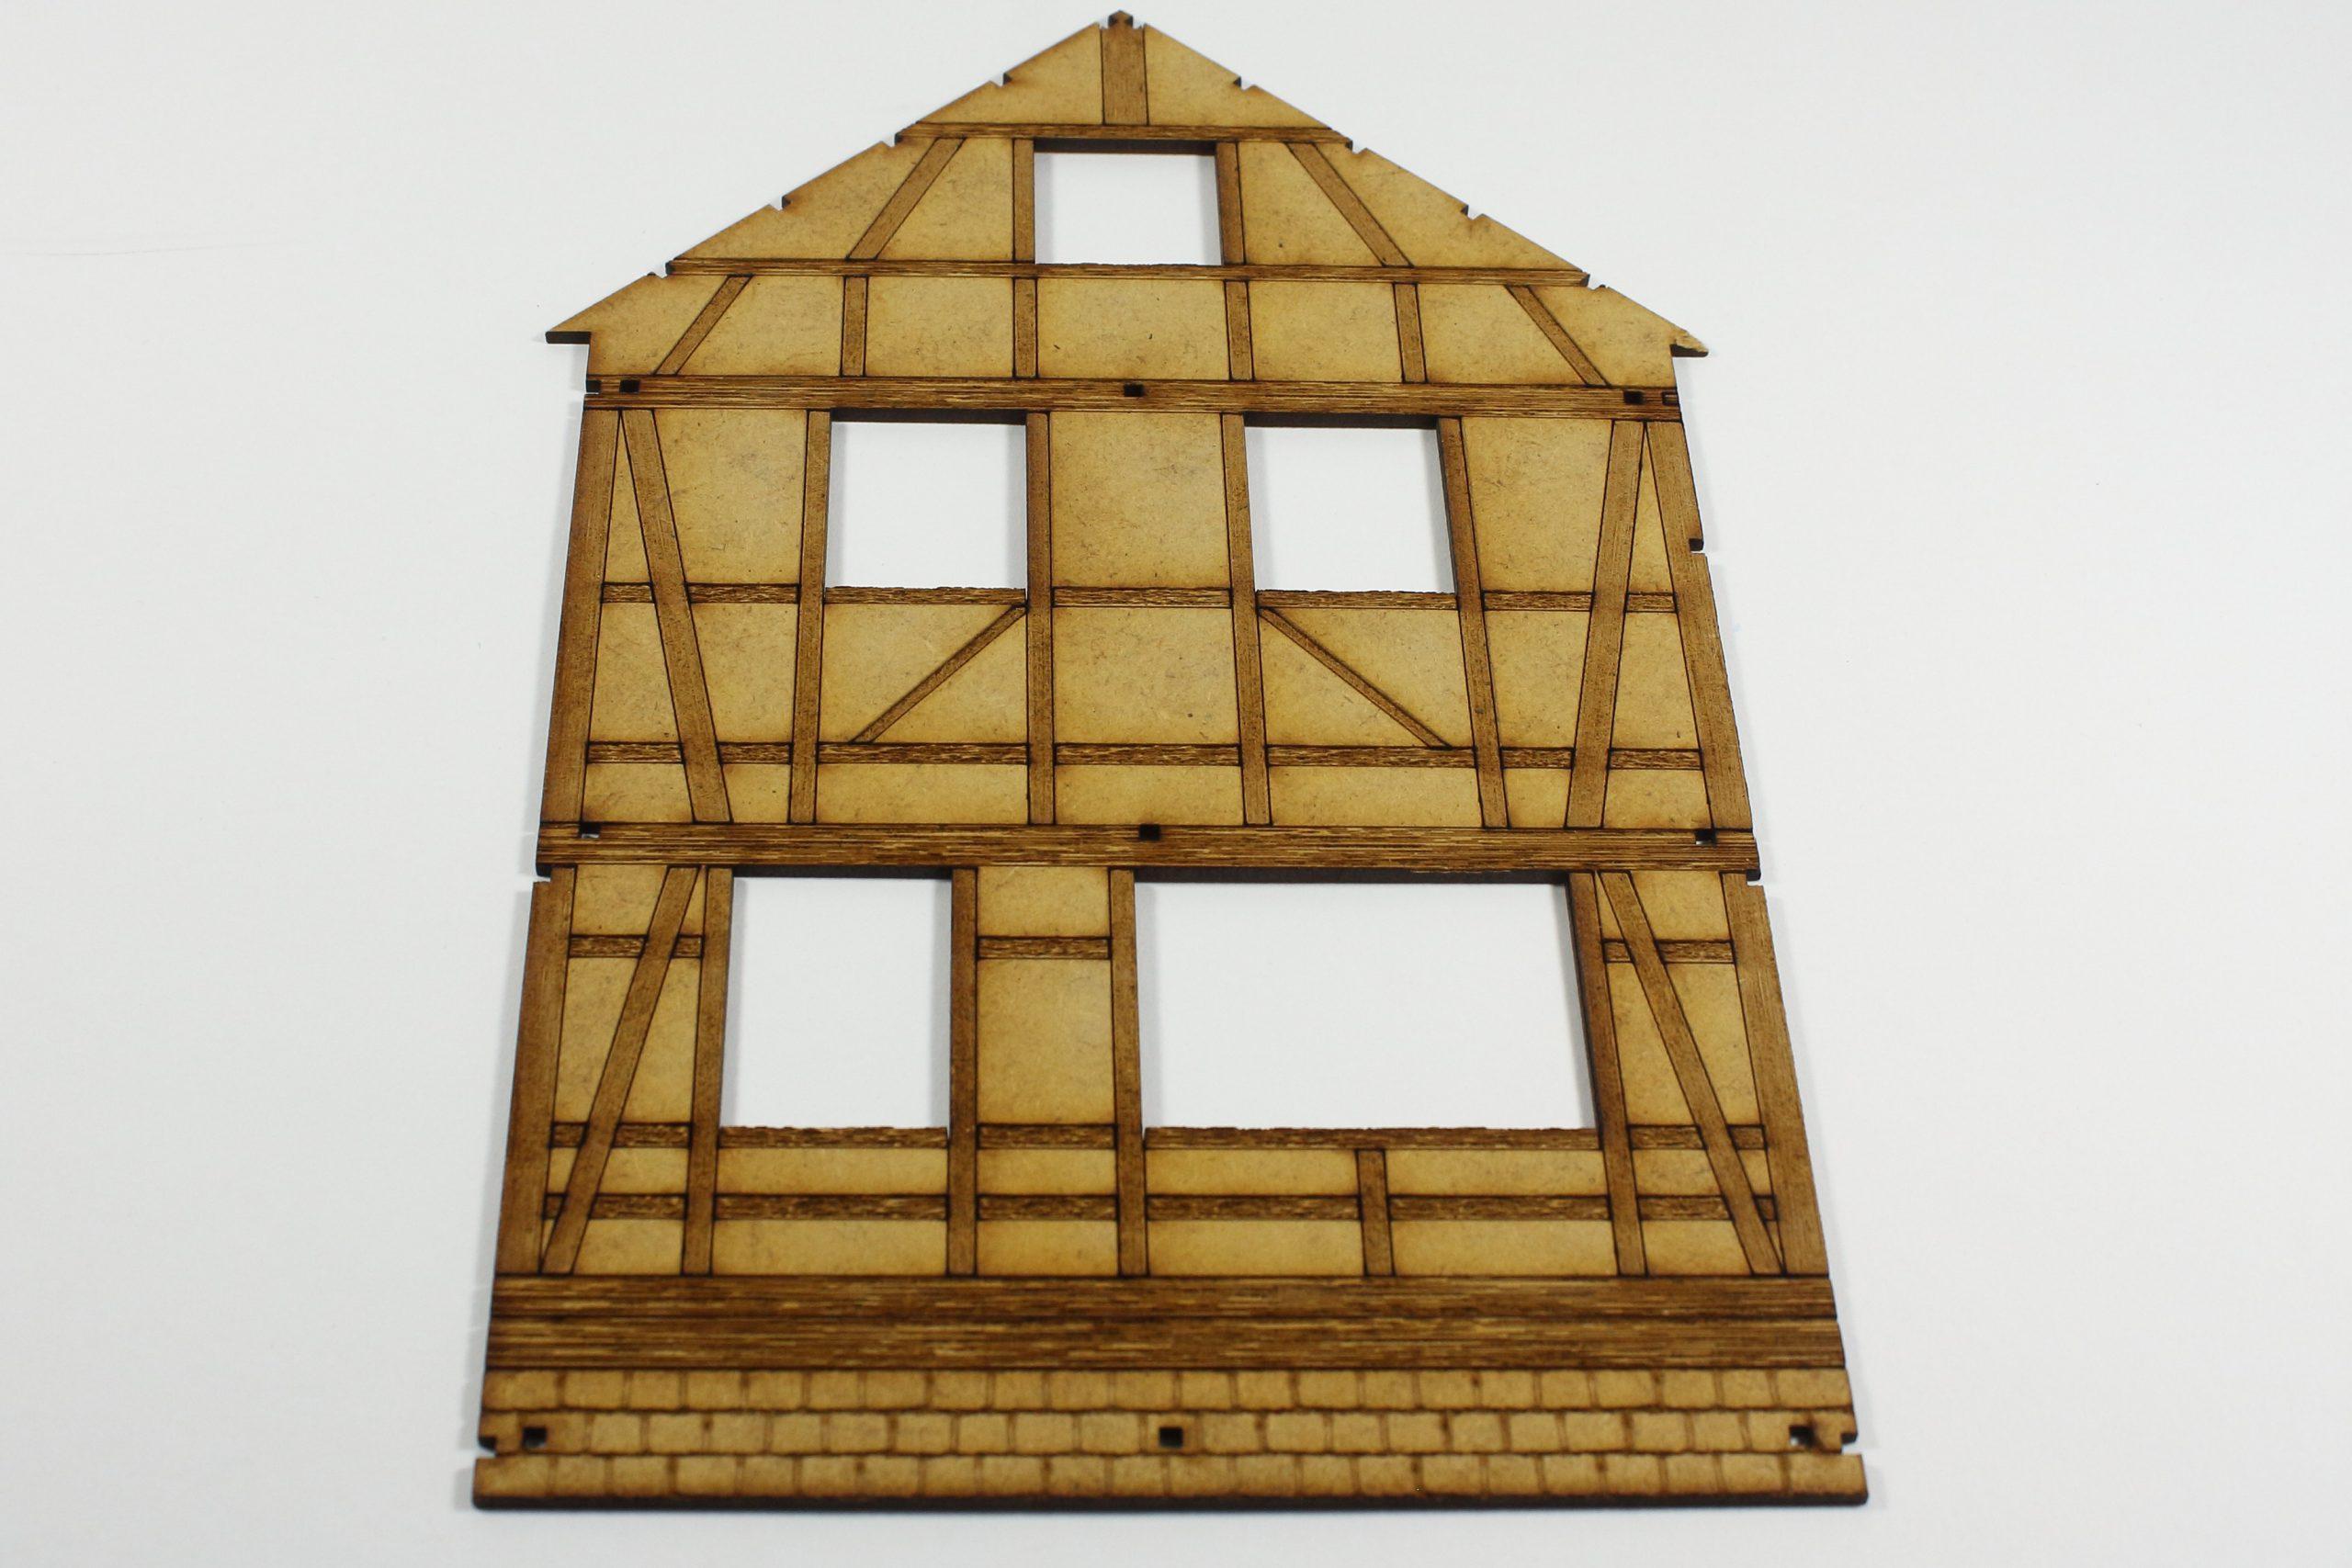 Bild-1-scaled Fachwerkhaus mit Holzschuppen - Lasercut Modellbaushop 1:35